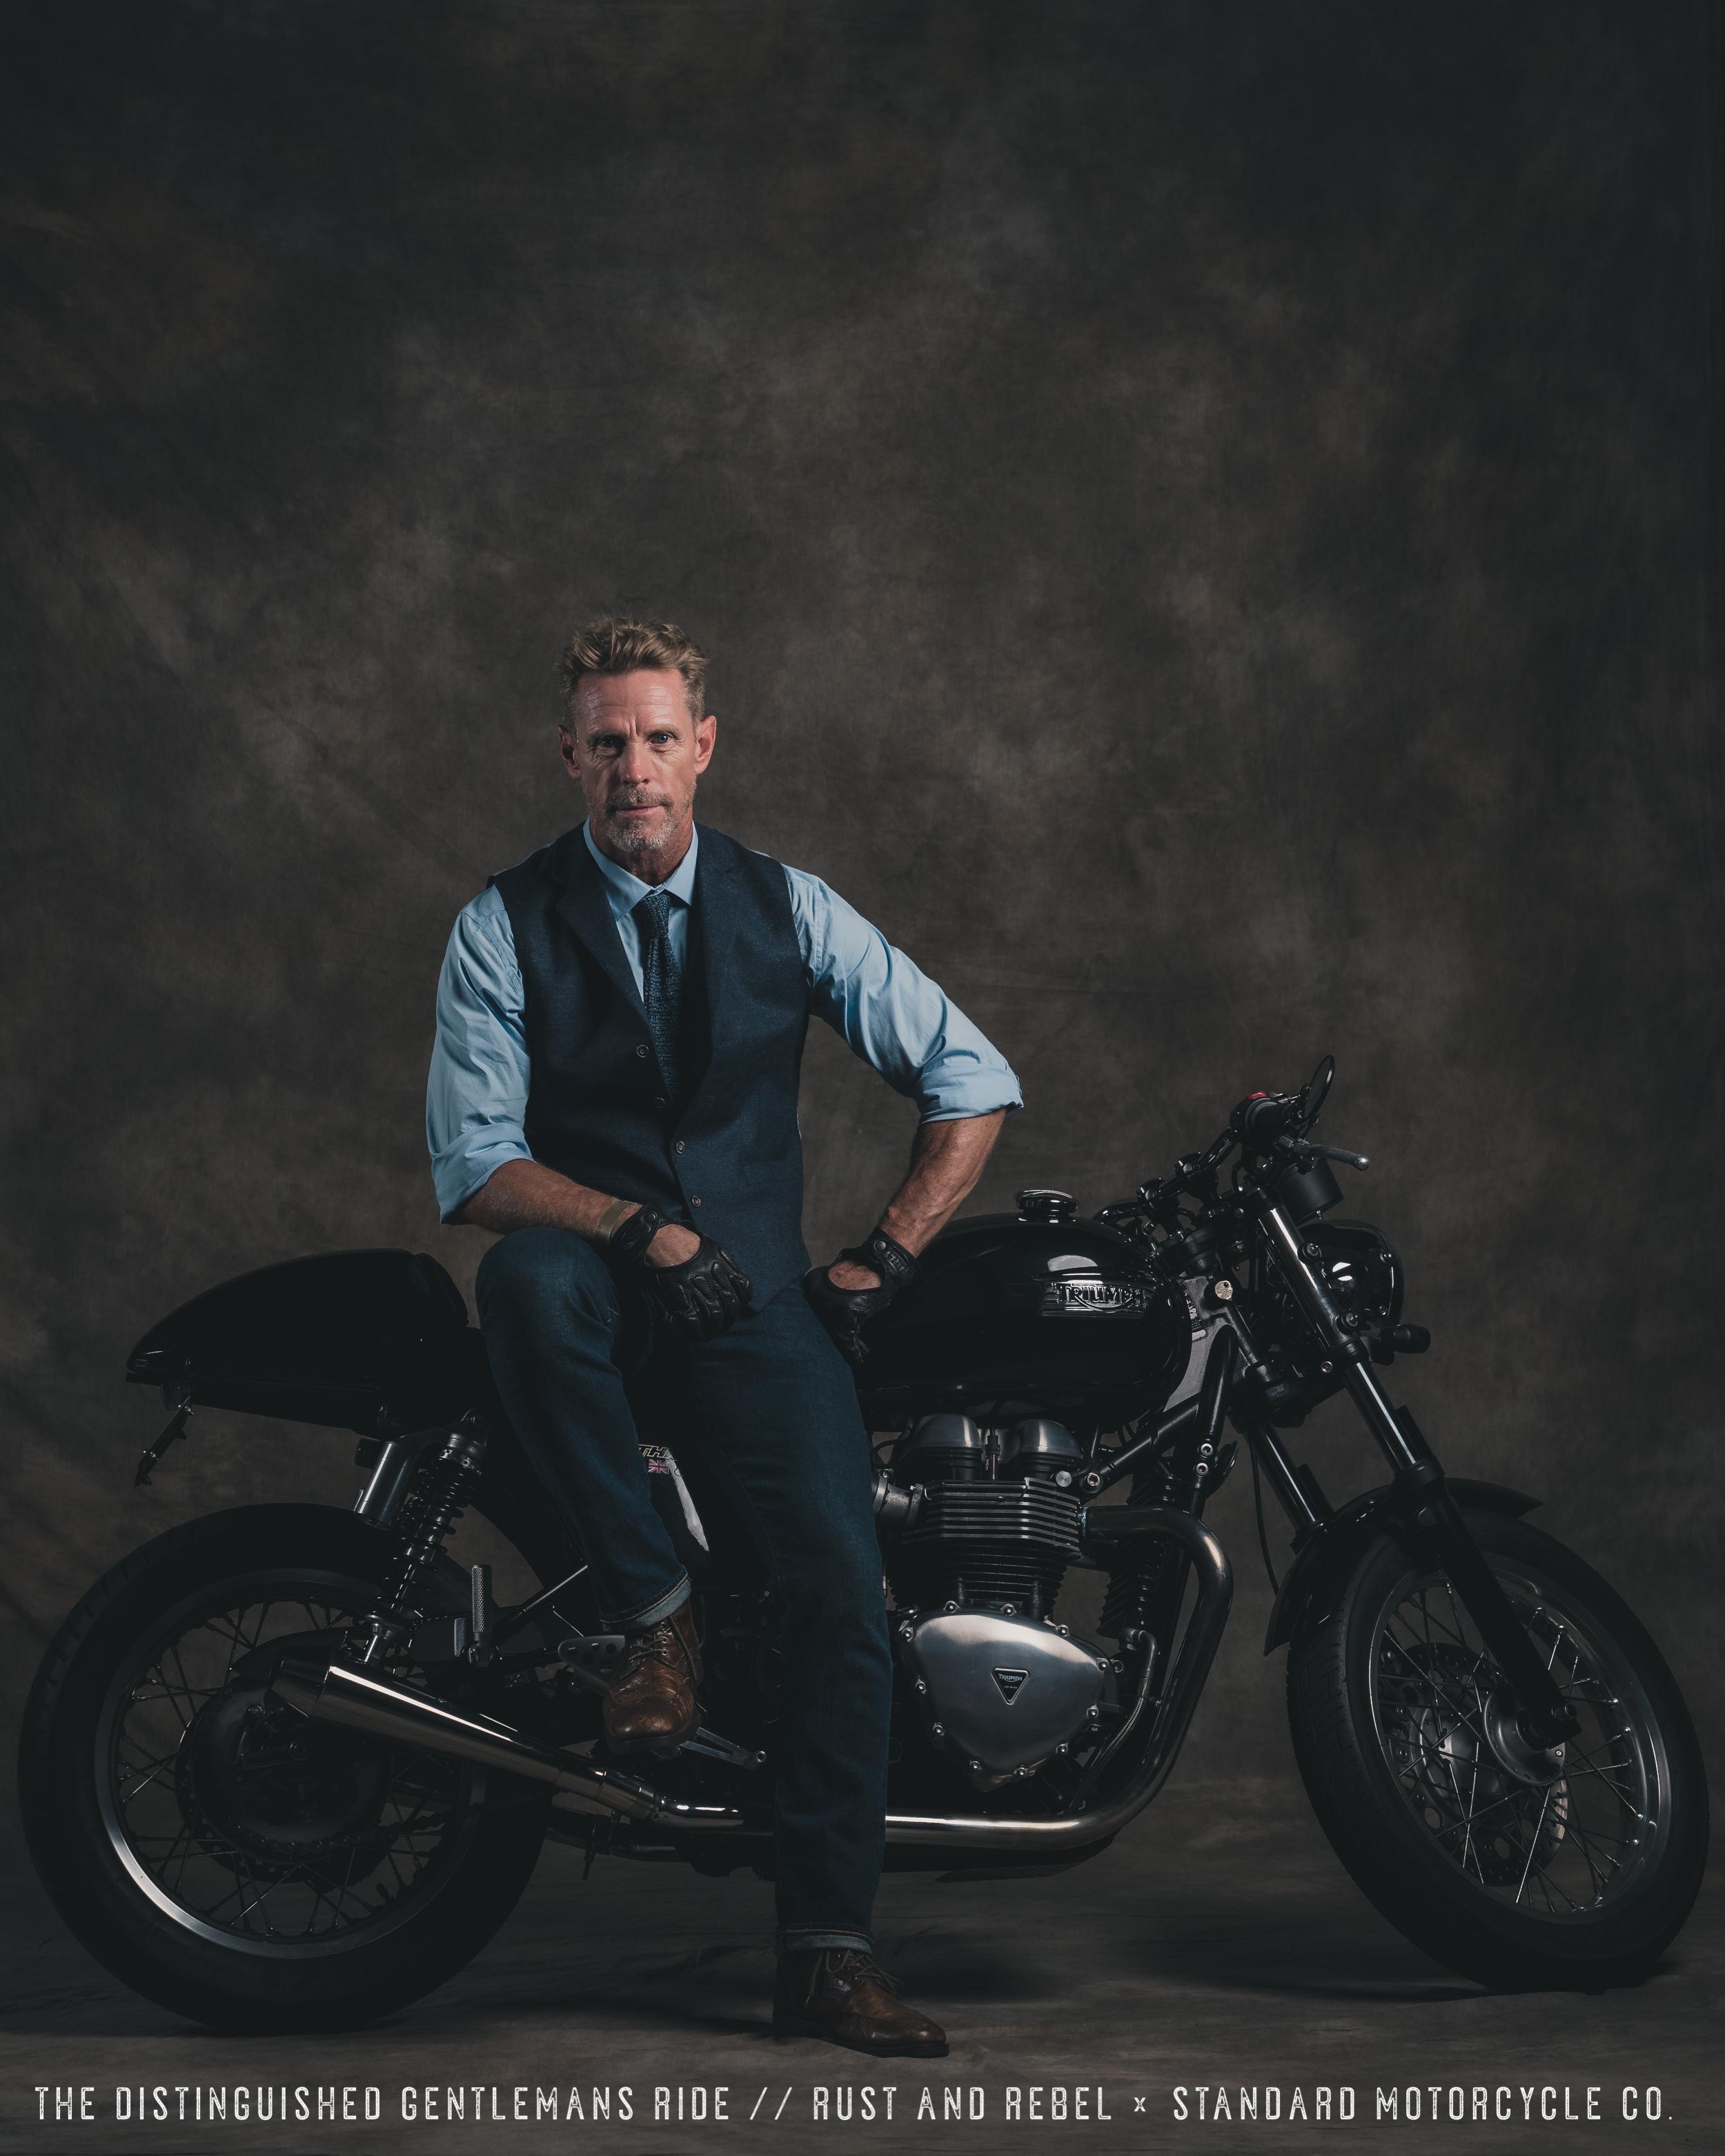 The Distinguished Gentleman's Ride 2019 [PEOPLE - PHOTO BY @MIKEDUNNUSA] - 0172.jpg